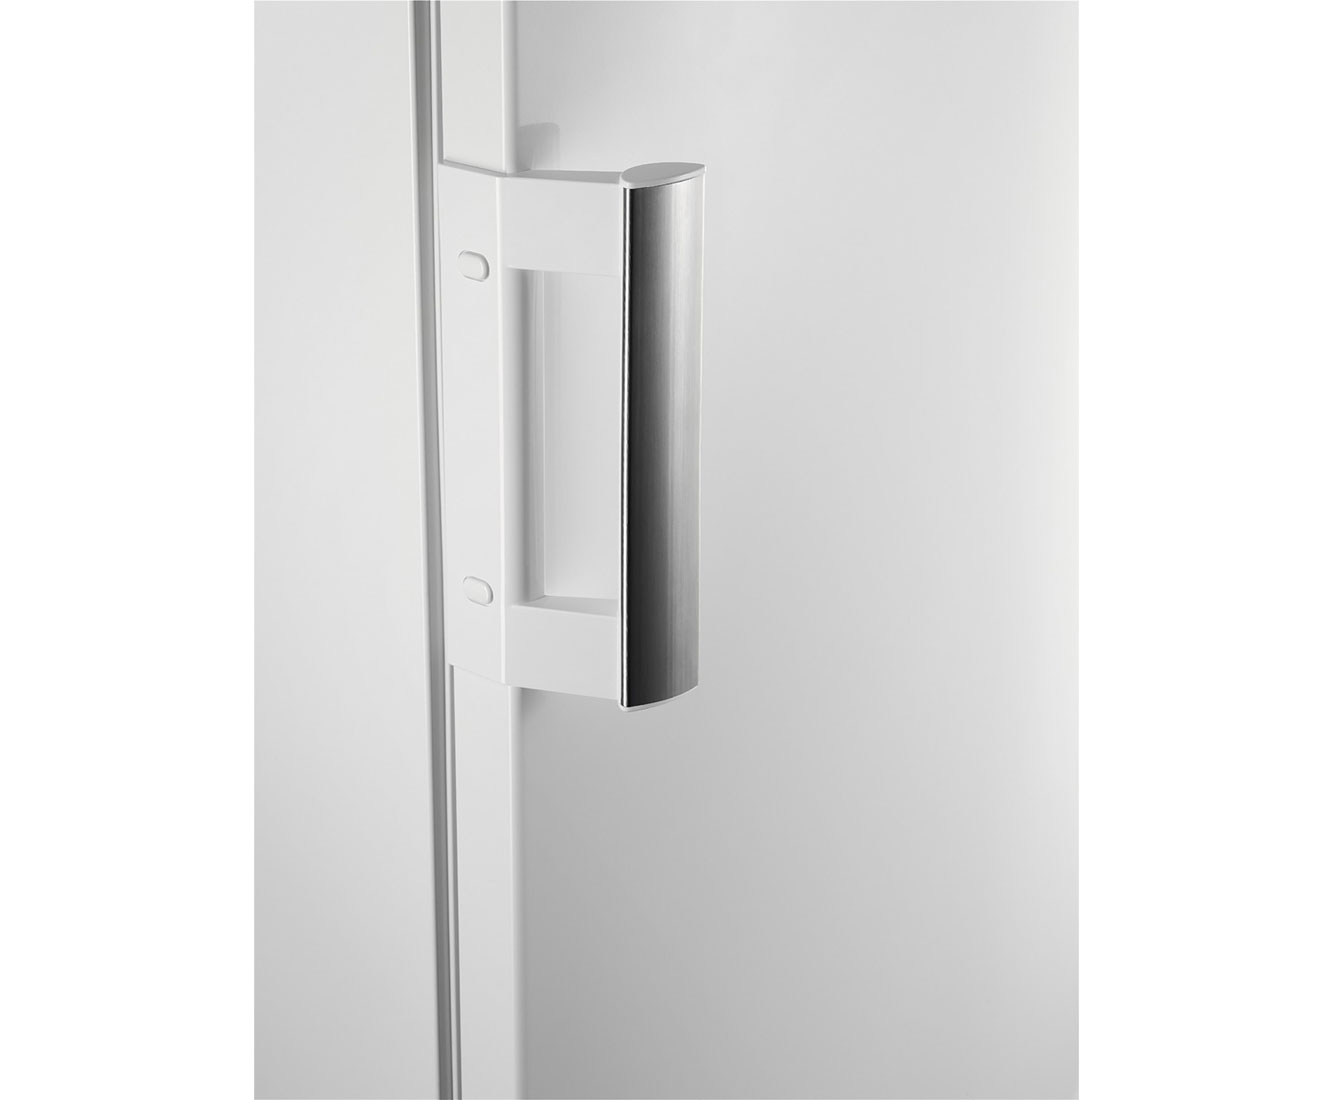 Aeg Kühlschrank Stufen : Aeg rtb aw kühlschrank santo freistehend cm weiß neu ebay